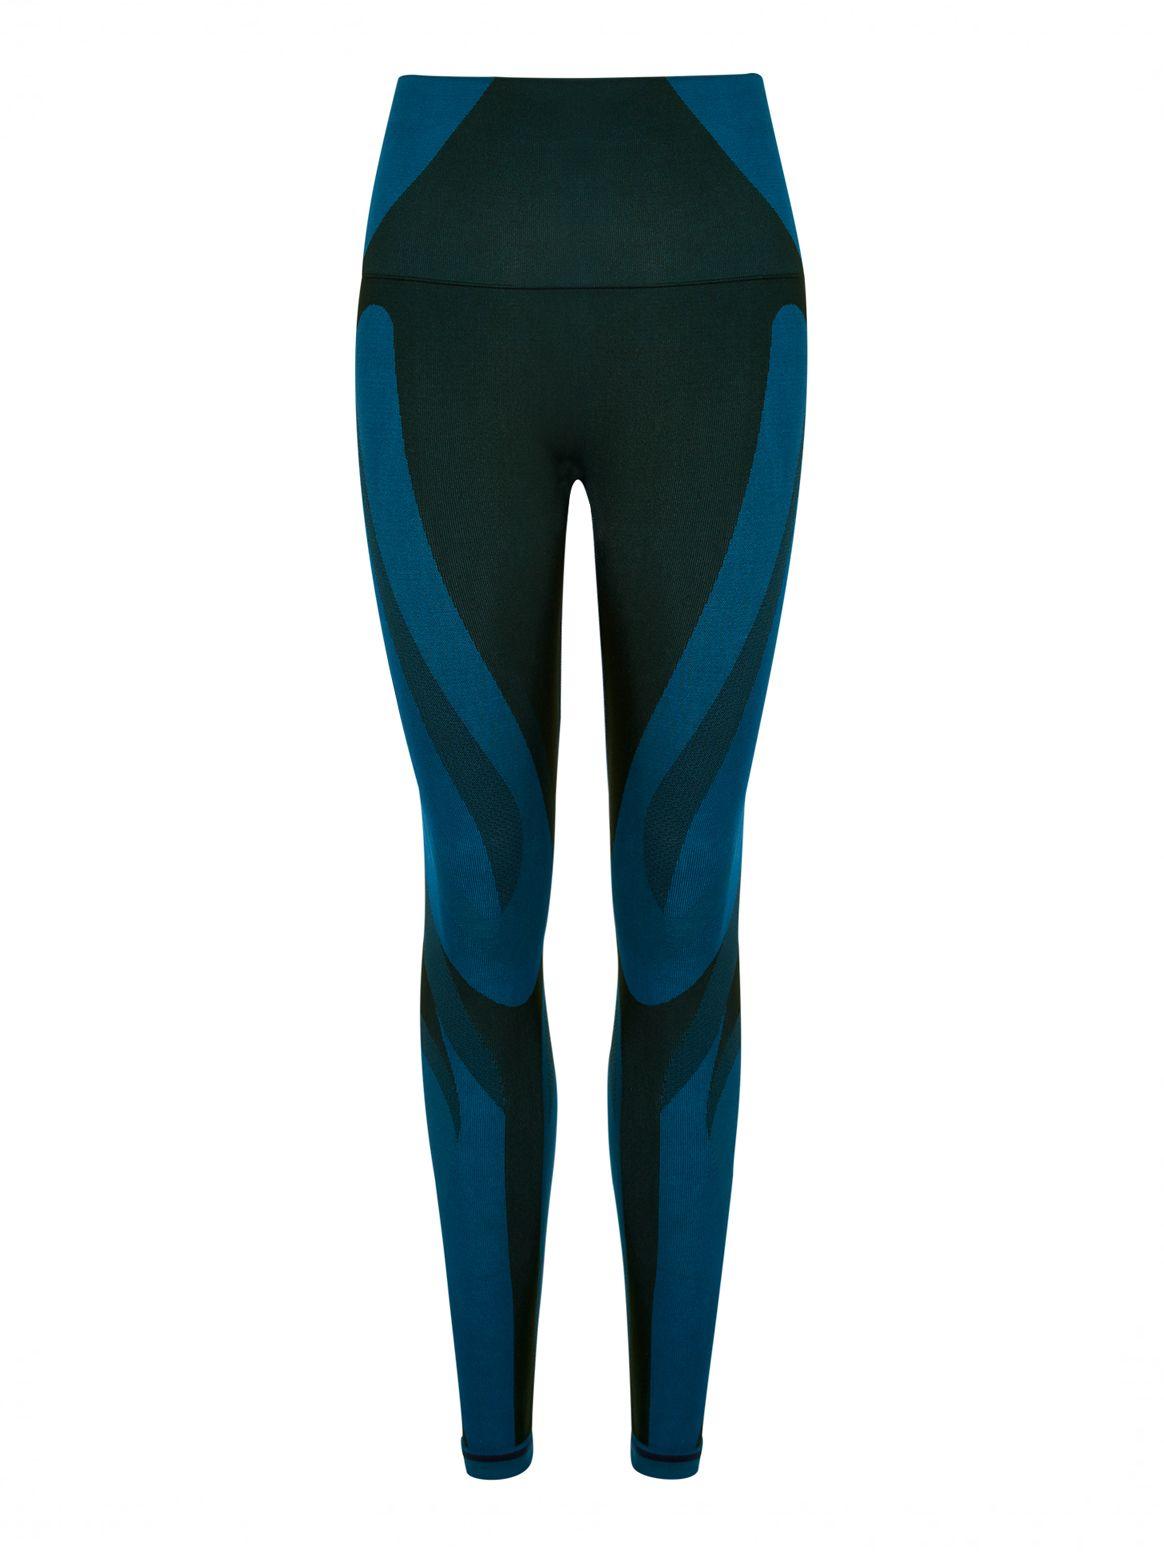 Activewear Fashercise Seasons Petrol All Leggings Lndr For Khaki K1xSqwya